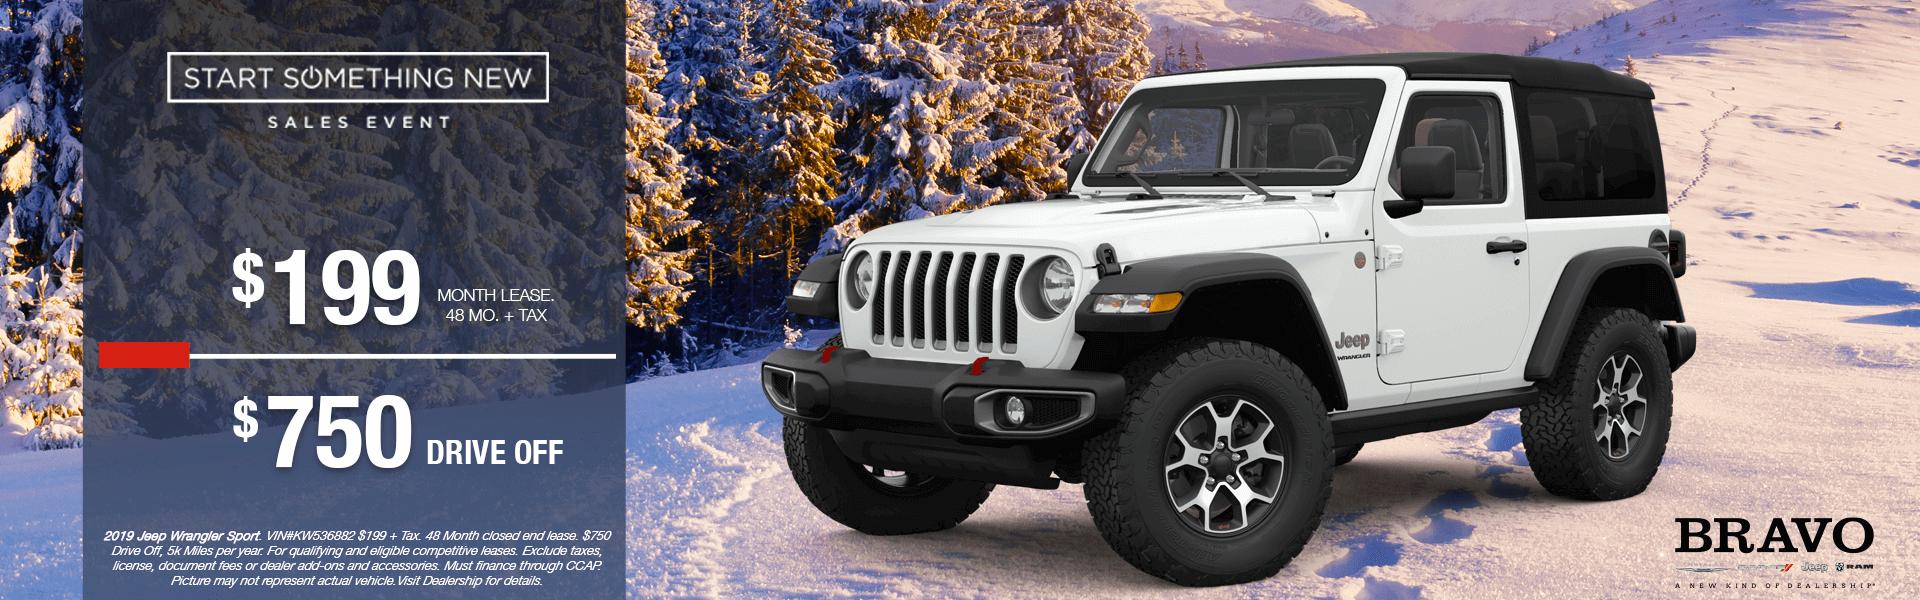 Jeep Wrangler $750 Drive Off